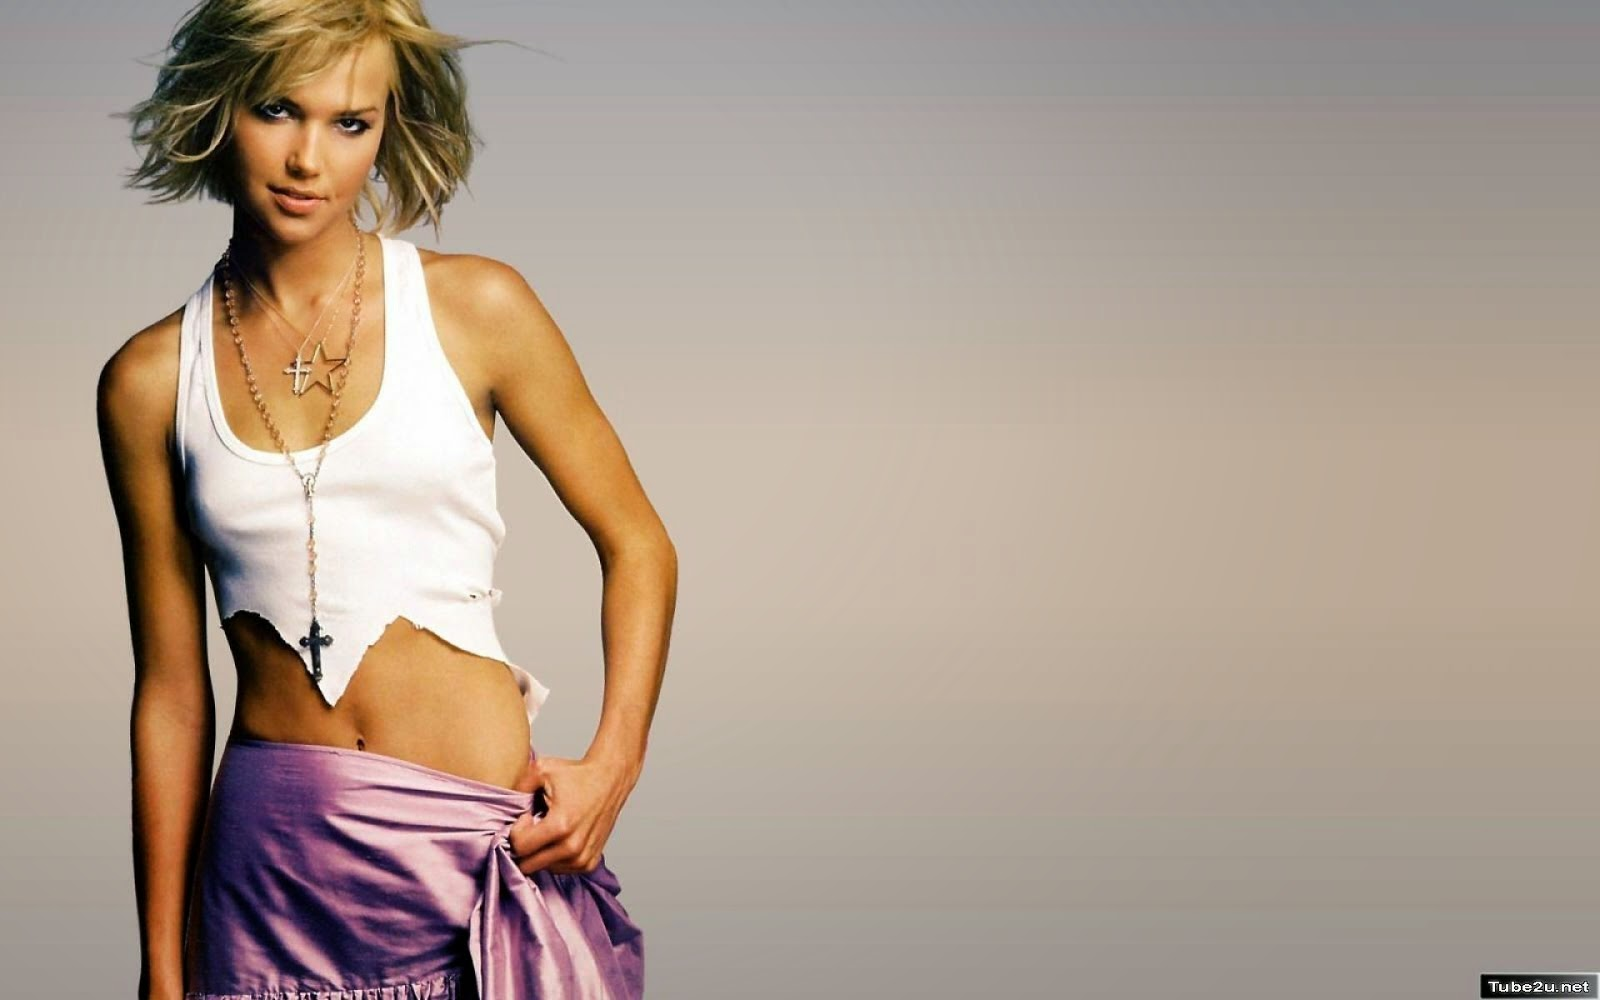 Arielle Kebbel Hot Sey American Model Actress Pictures Caroline